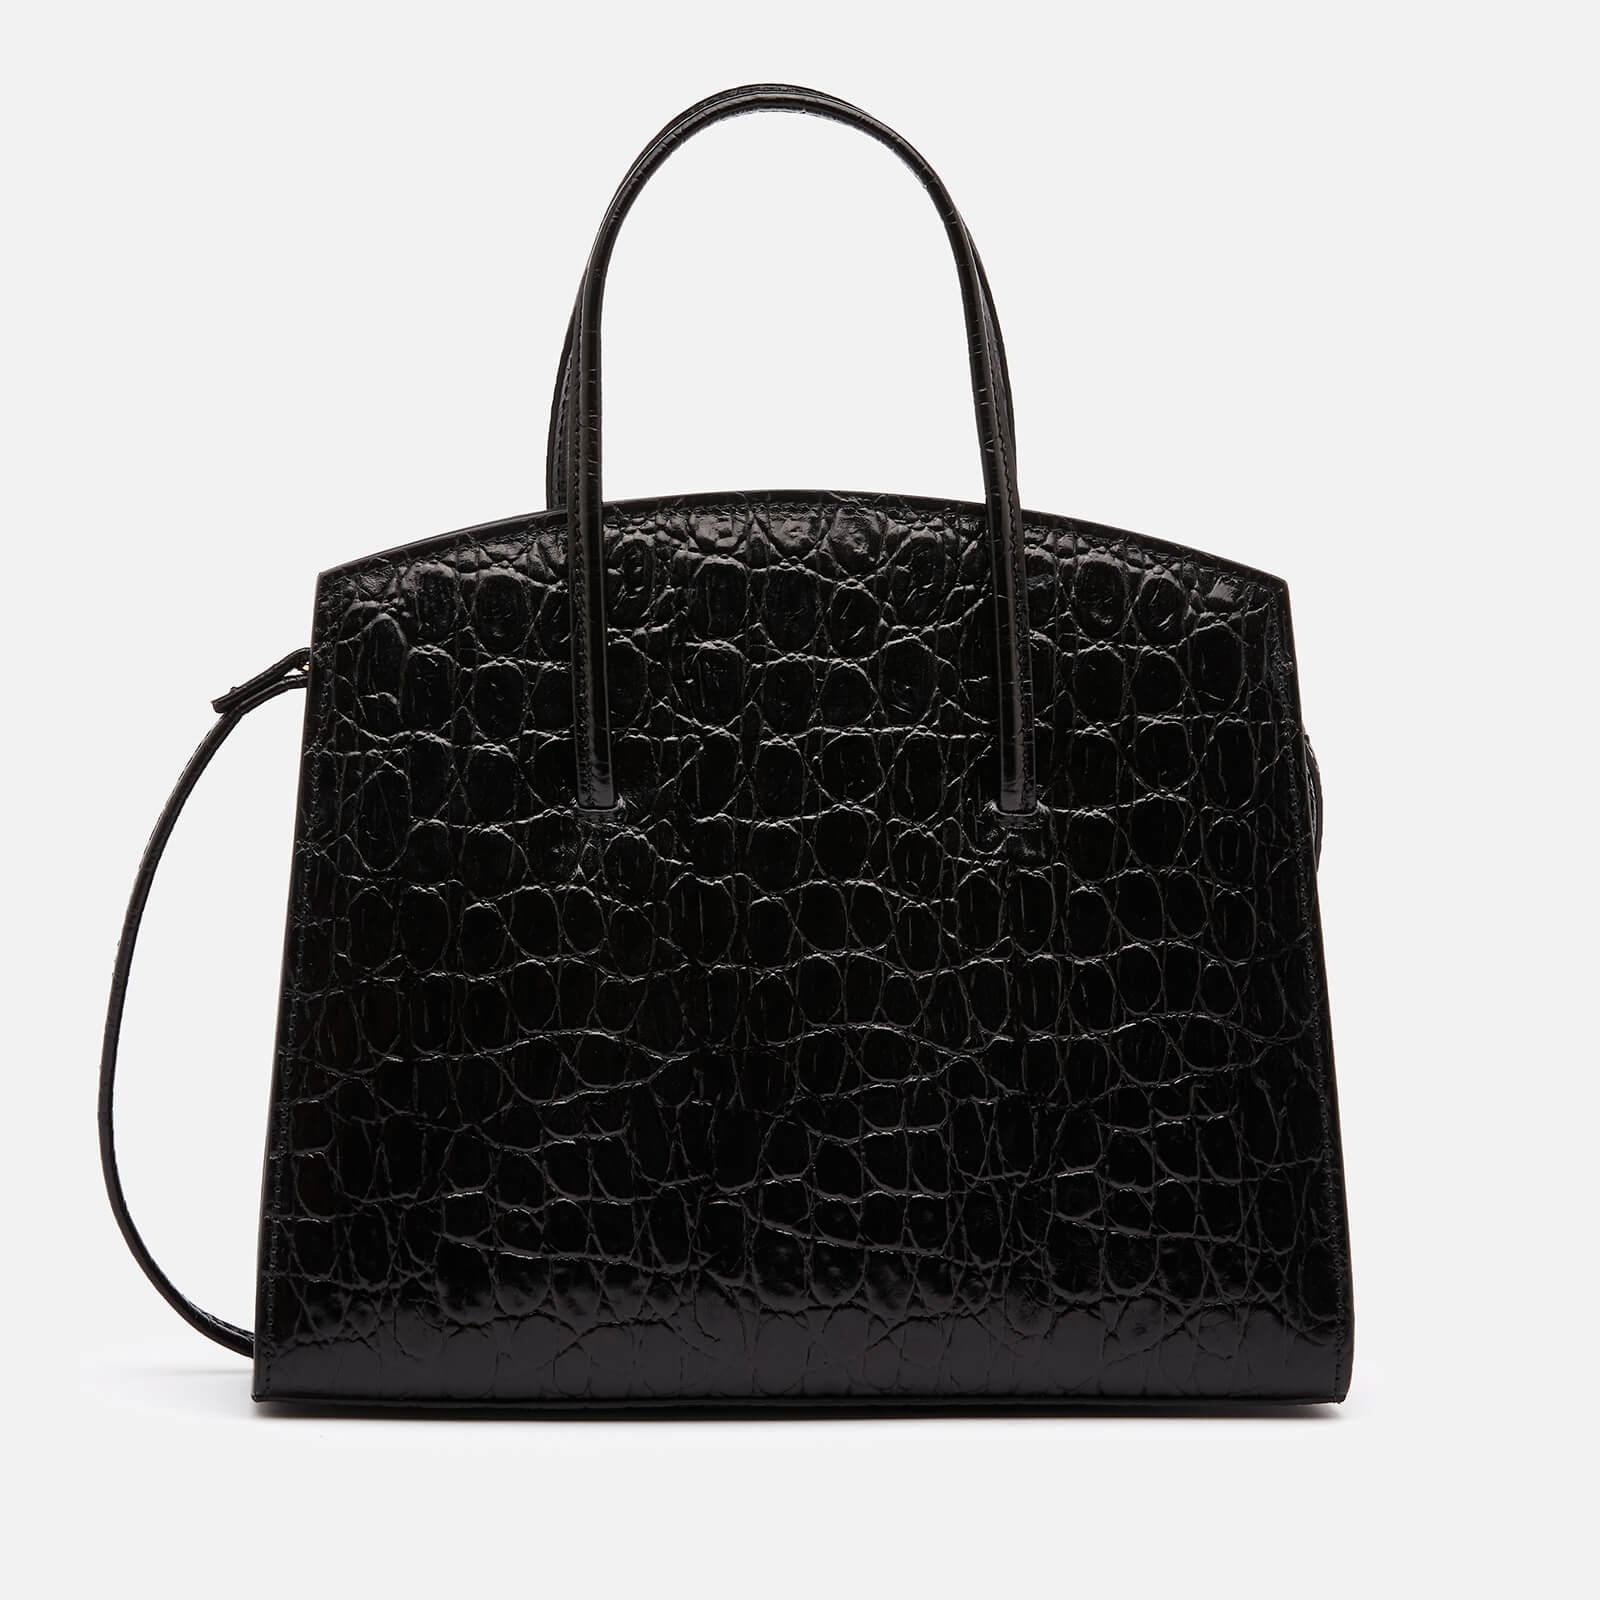 Little Liffner Women's Minimal Croc Mini Tote Bag - Black